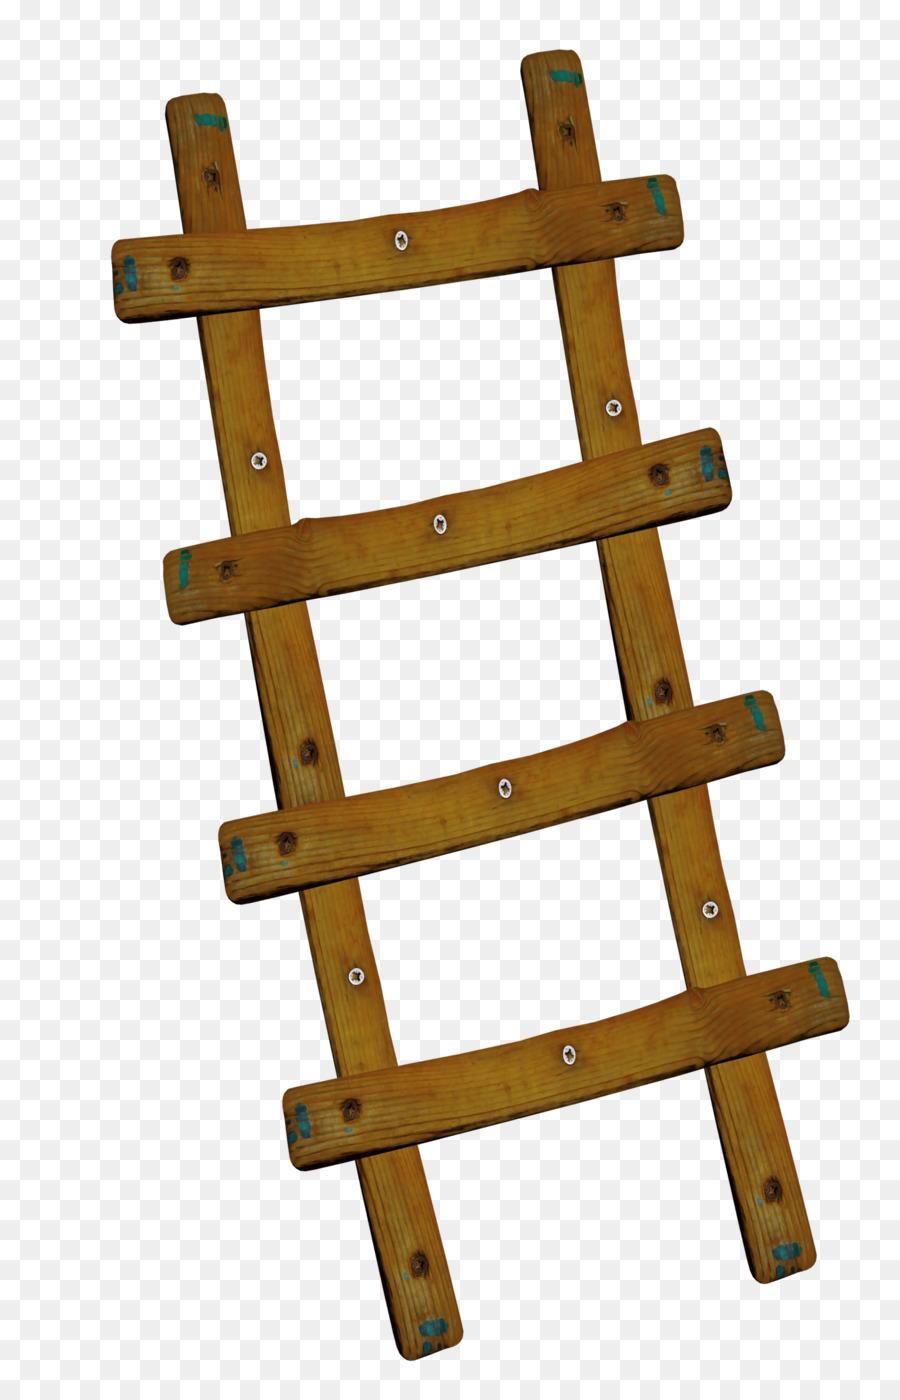 Ladder Cartoon png download - 1580*2449 - Free Transparent